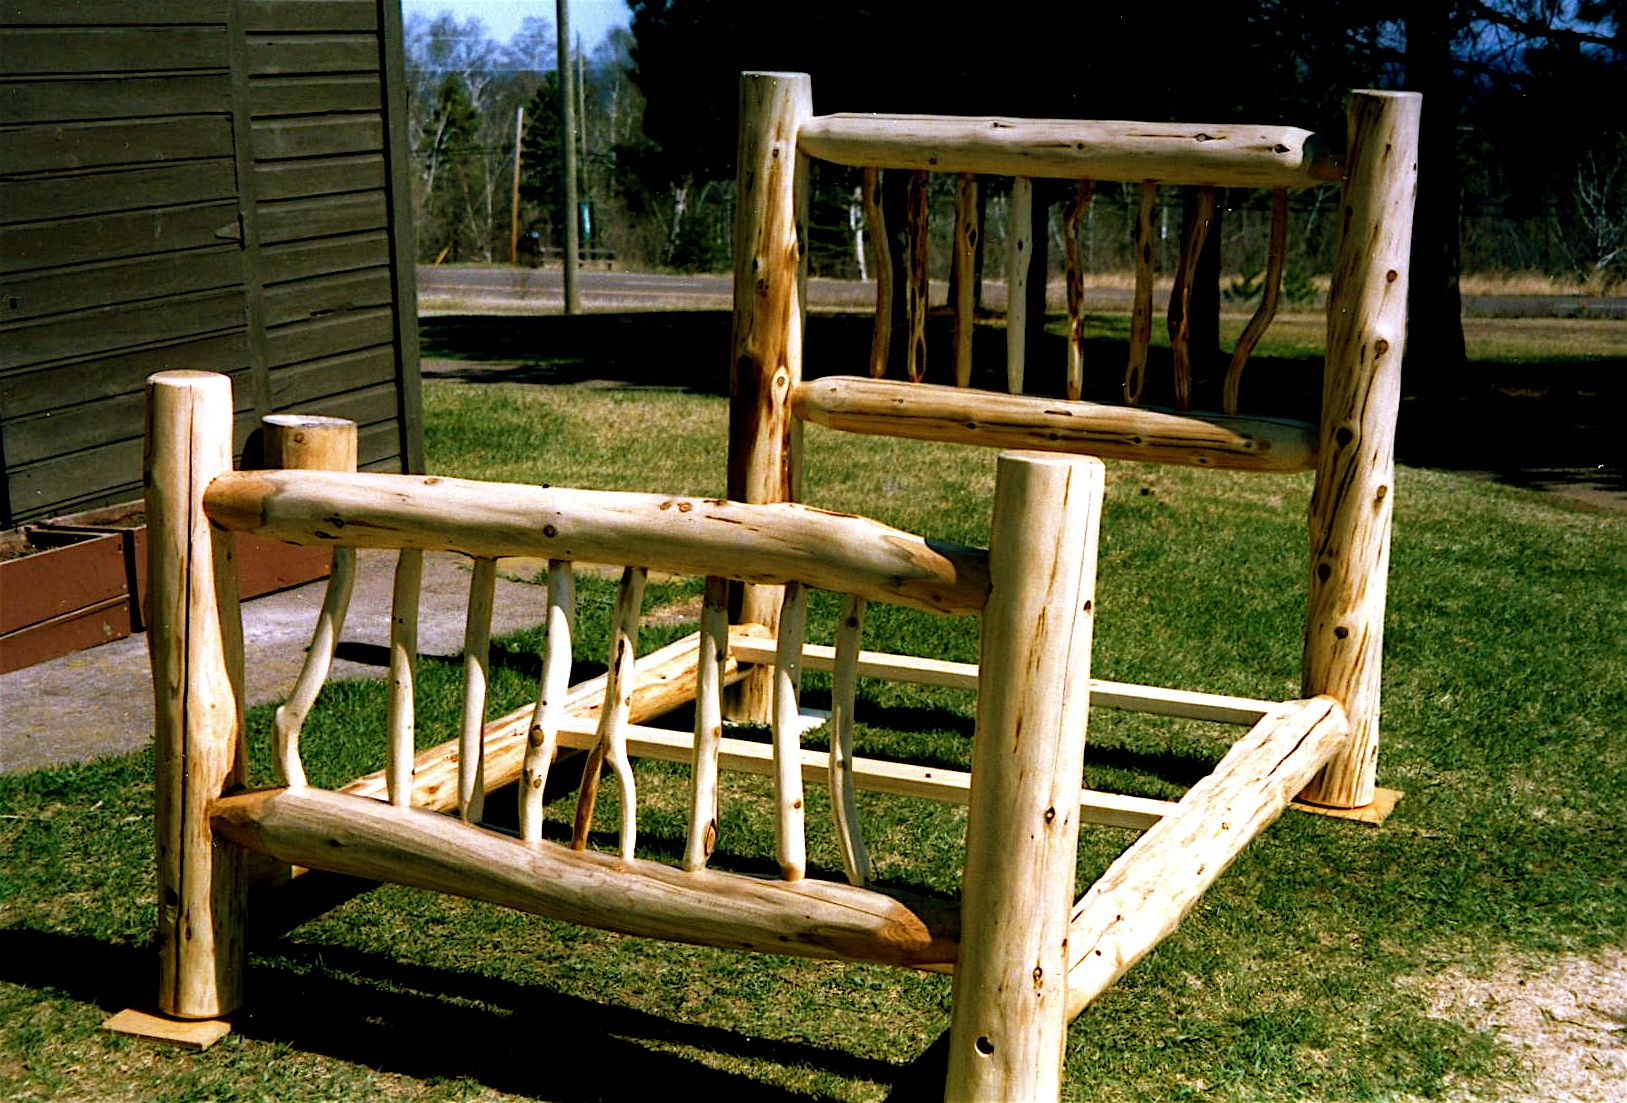 cedar wood bed frames   mnartists.org   Dave Woerheide   Diamond willow inlaid agate table II